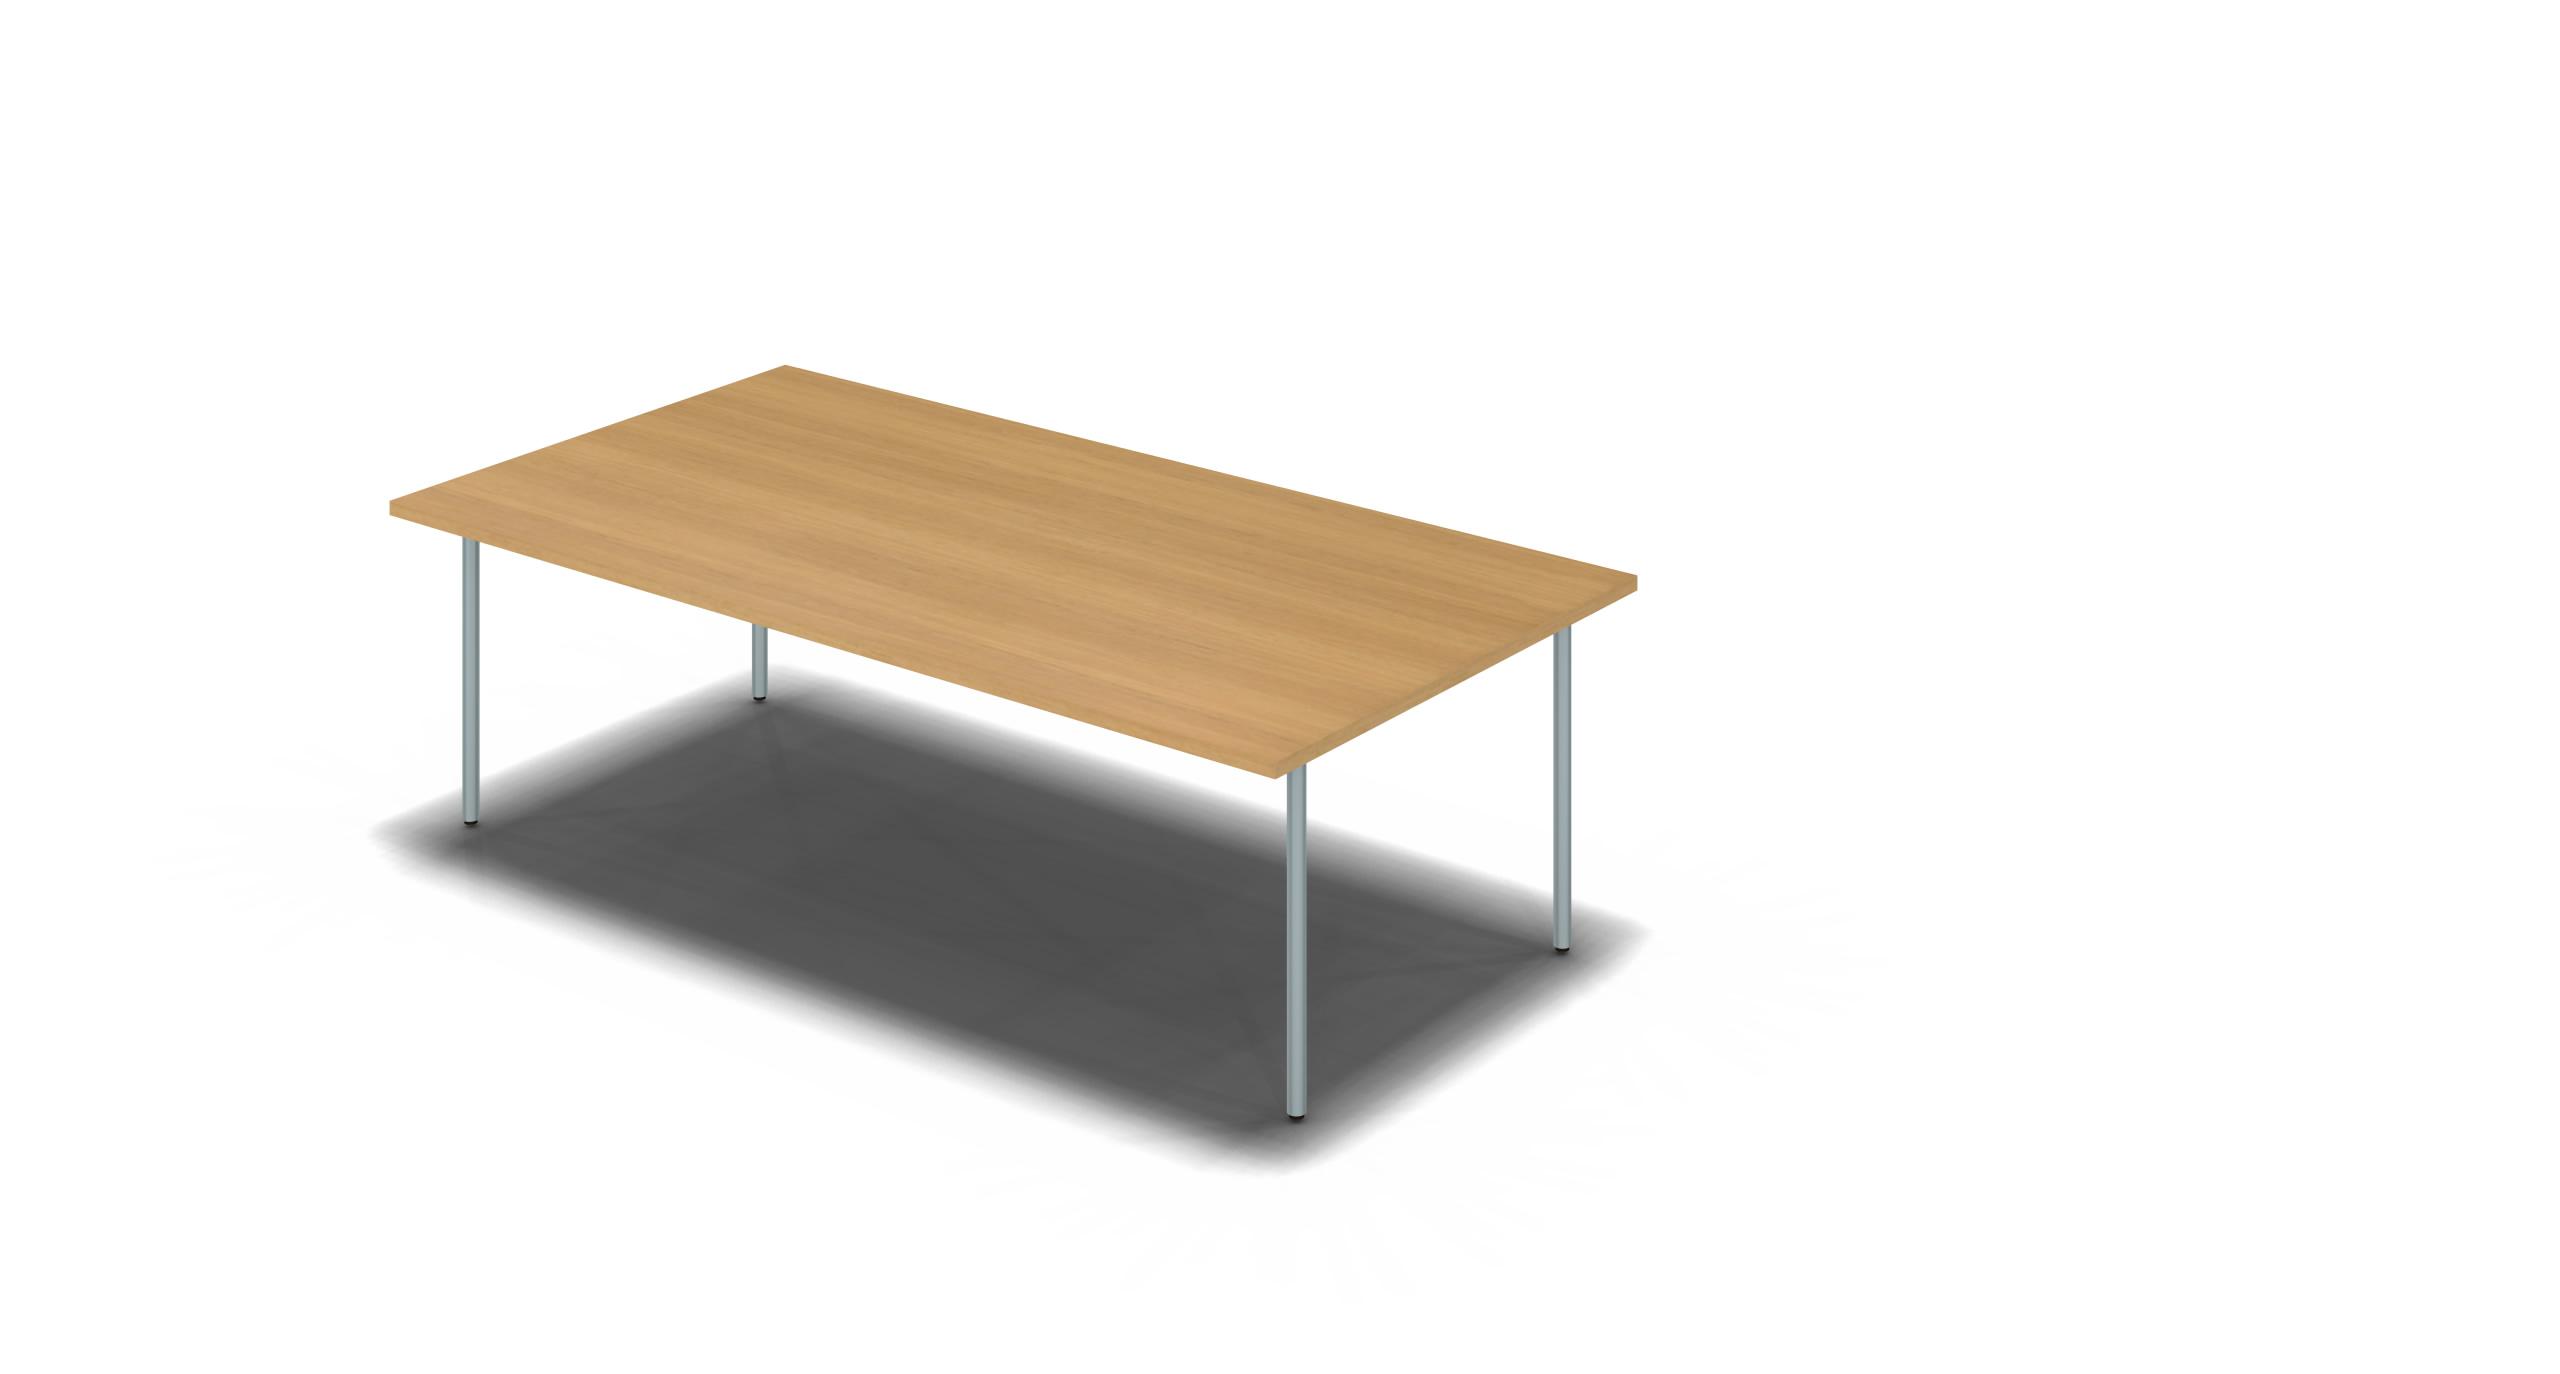 Table_Round_2100x1050_Silver_Oak_noOption